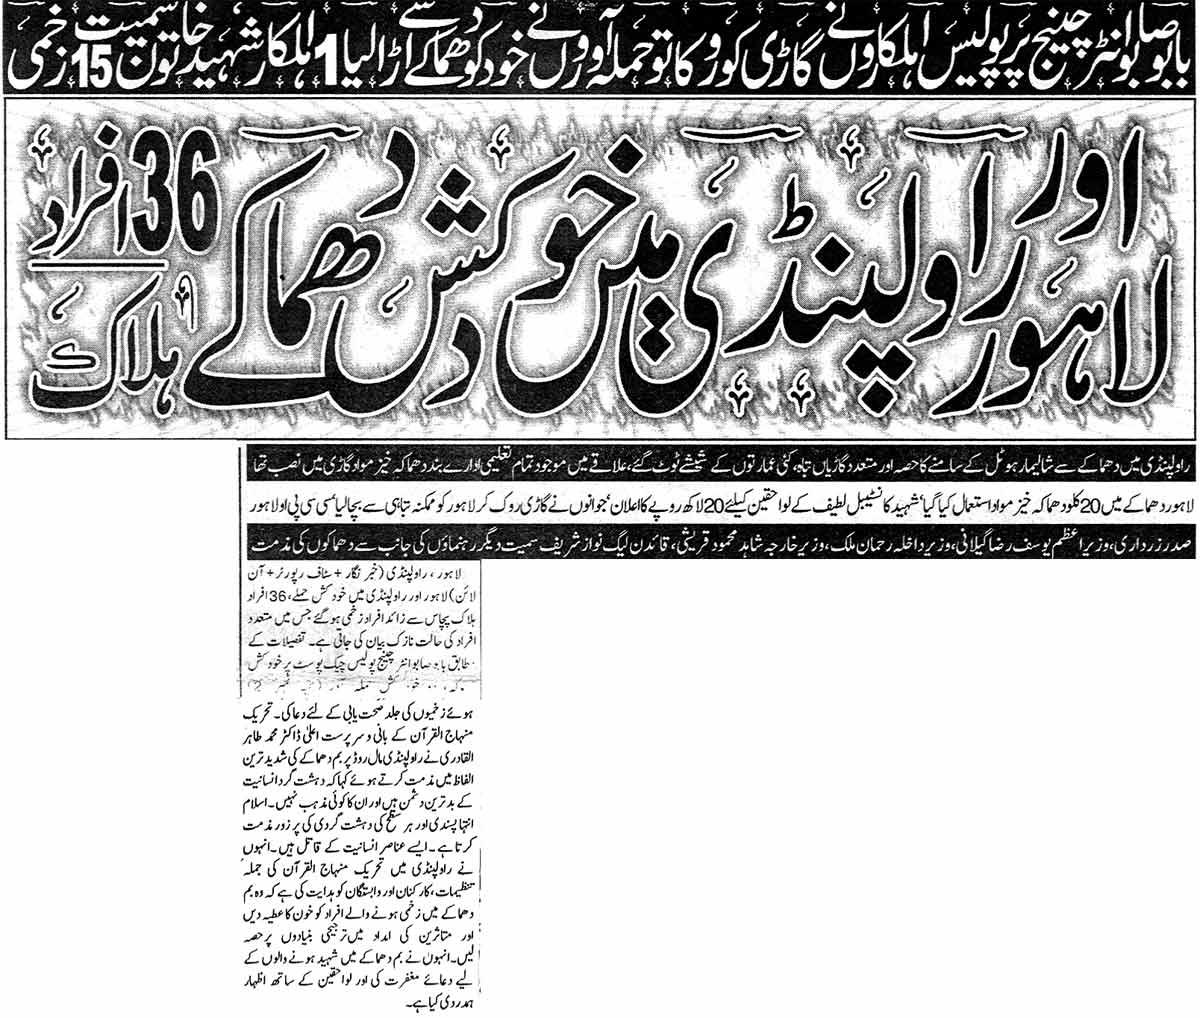 تحریک منہاج القرآن Minhaj-ul-Quran  Print Media Coverage پرنٹ میڈیا کوریج Daily Jurat  Front Page